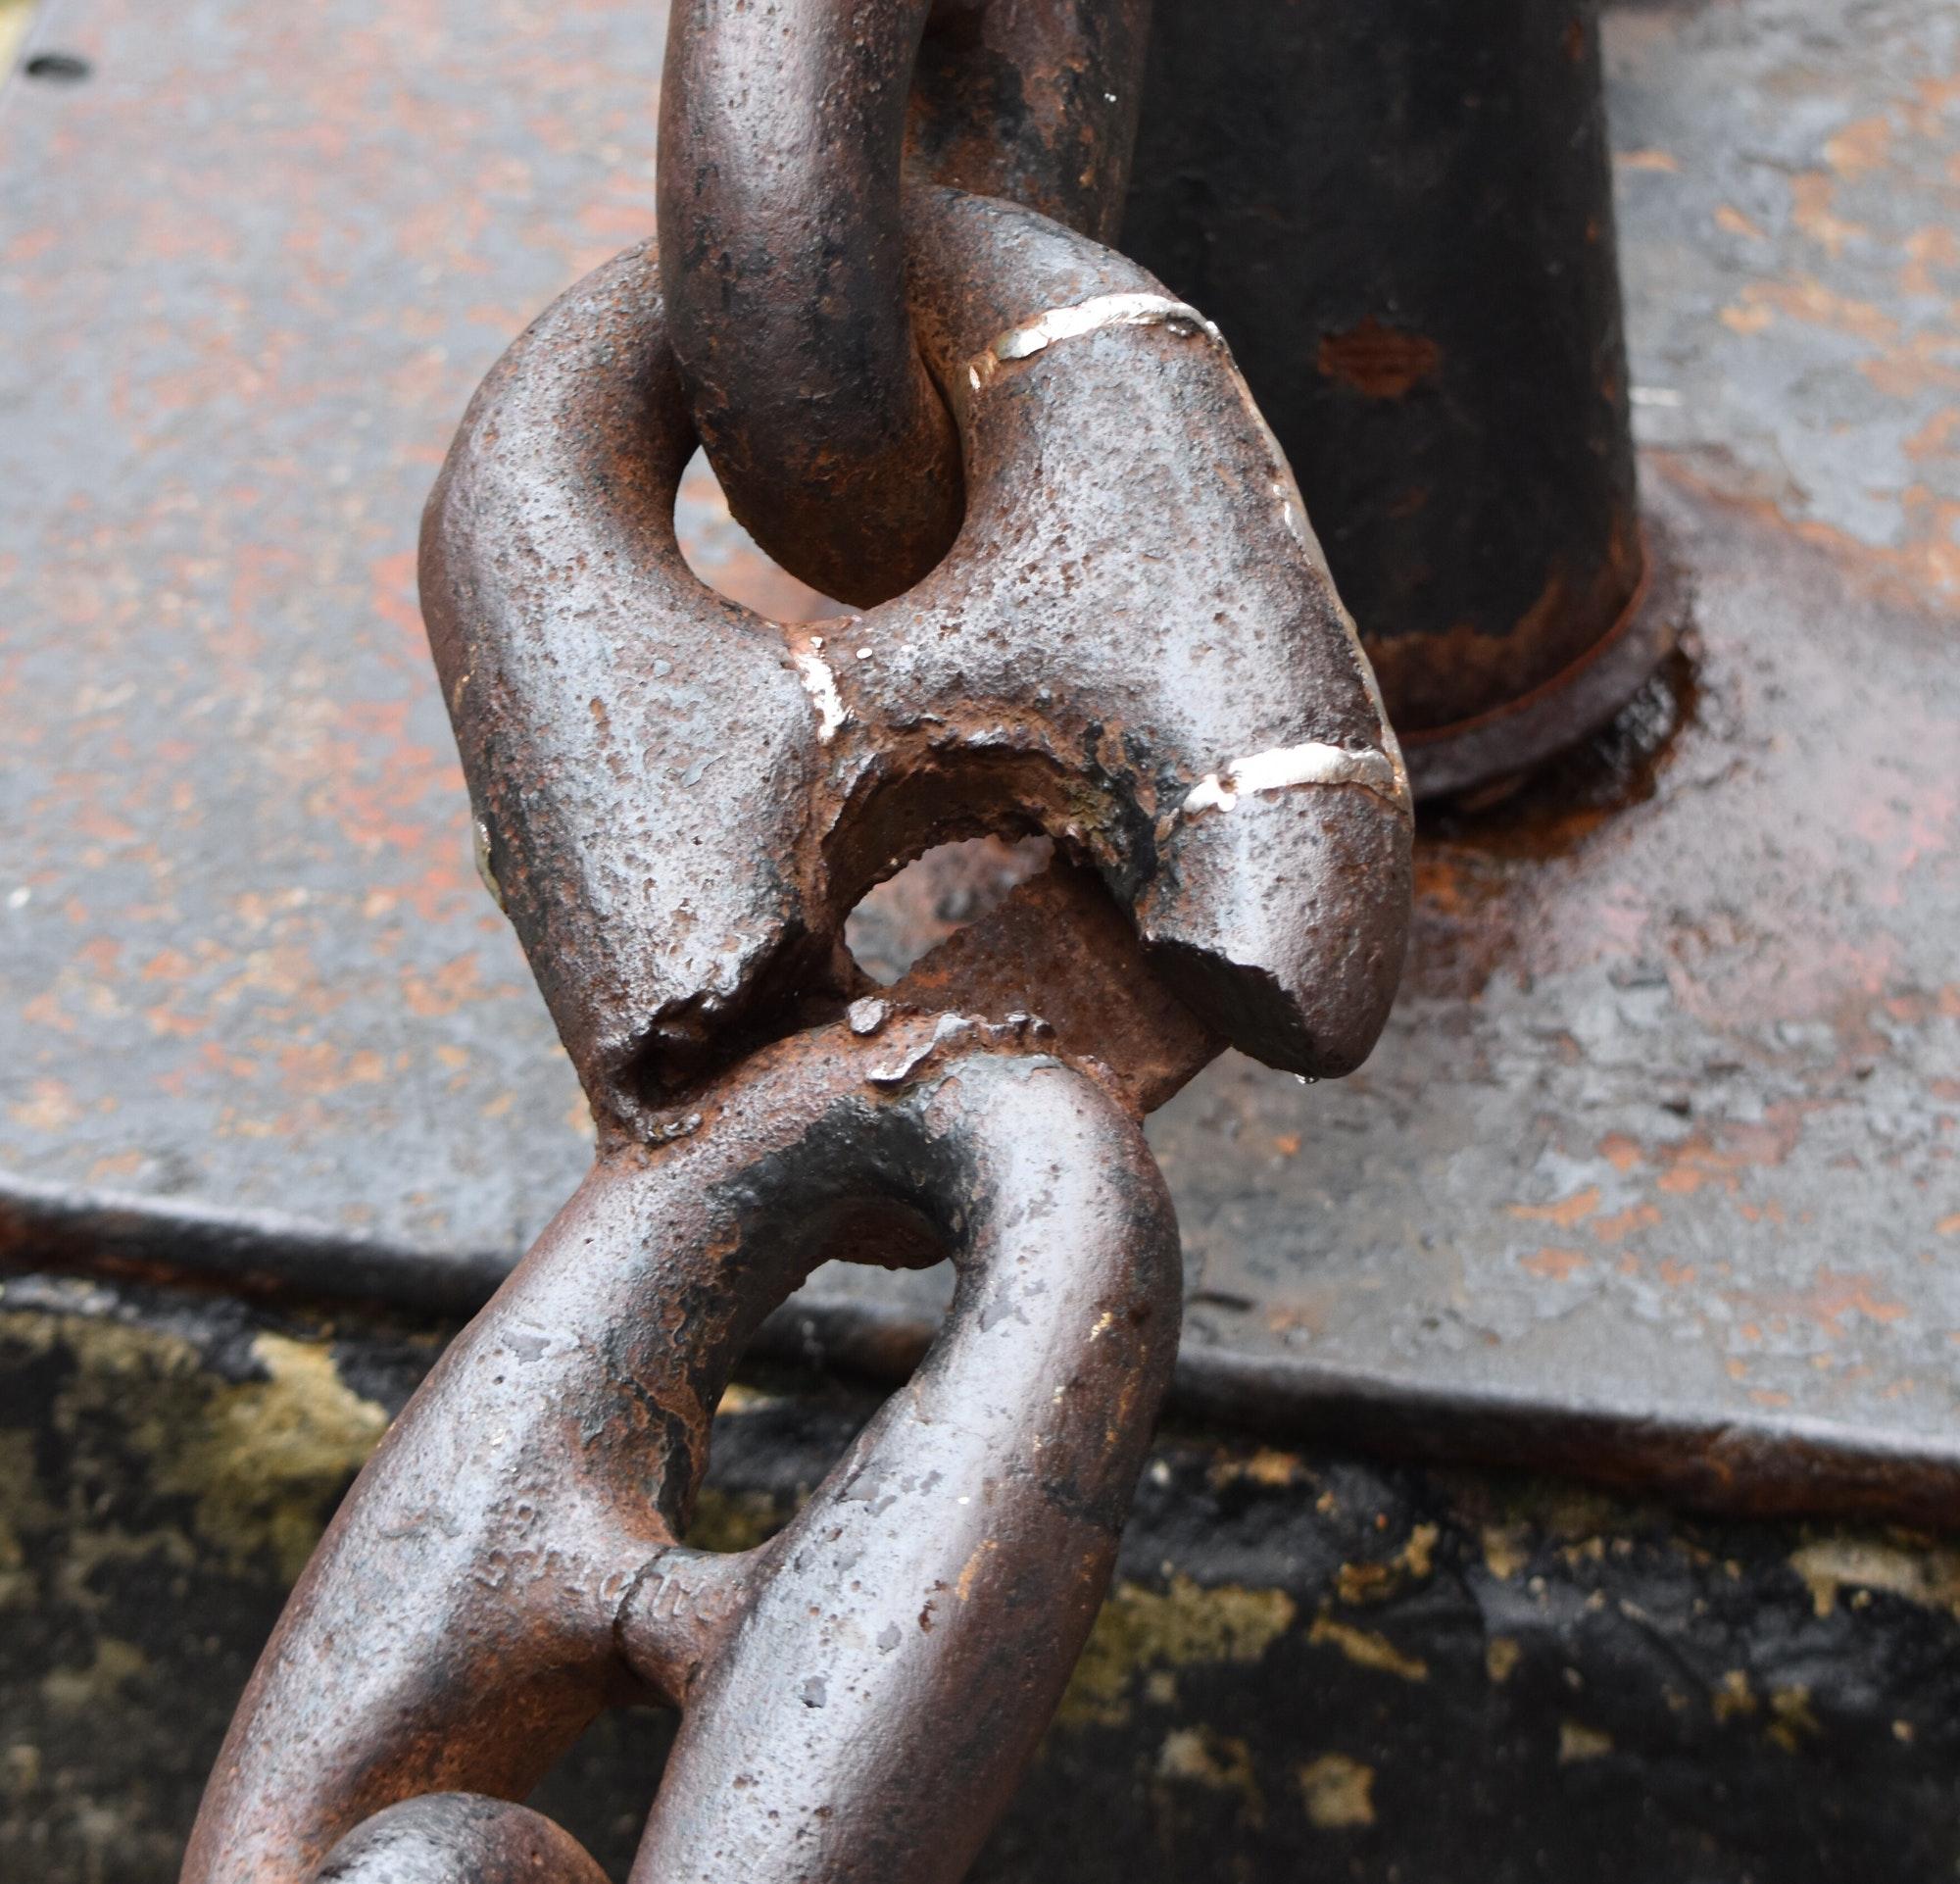 Broken chain. Business continuity. Interruptions broken links supply chain